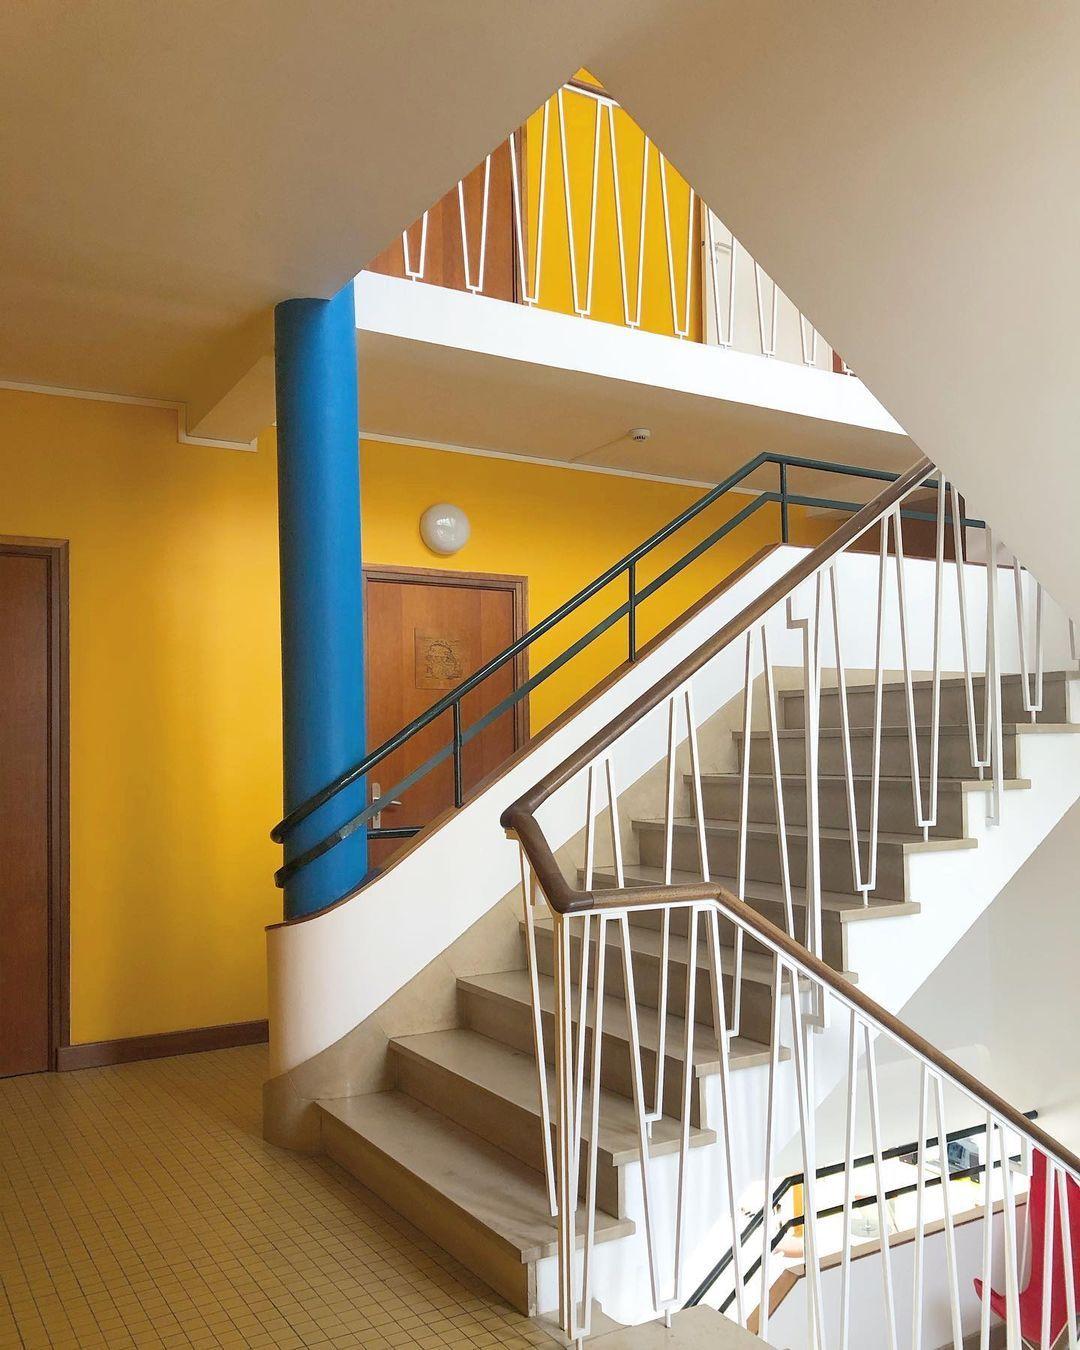 "Adam Štěch on Instagram: ""Hôtel Le Trident Thyrsé, architect Henri Zimmer, Royan, 1952-1953. #modernism #frenchmodernism #royanmodernism #modernarchitecture…"""